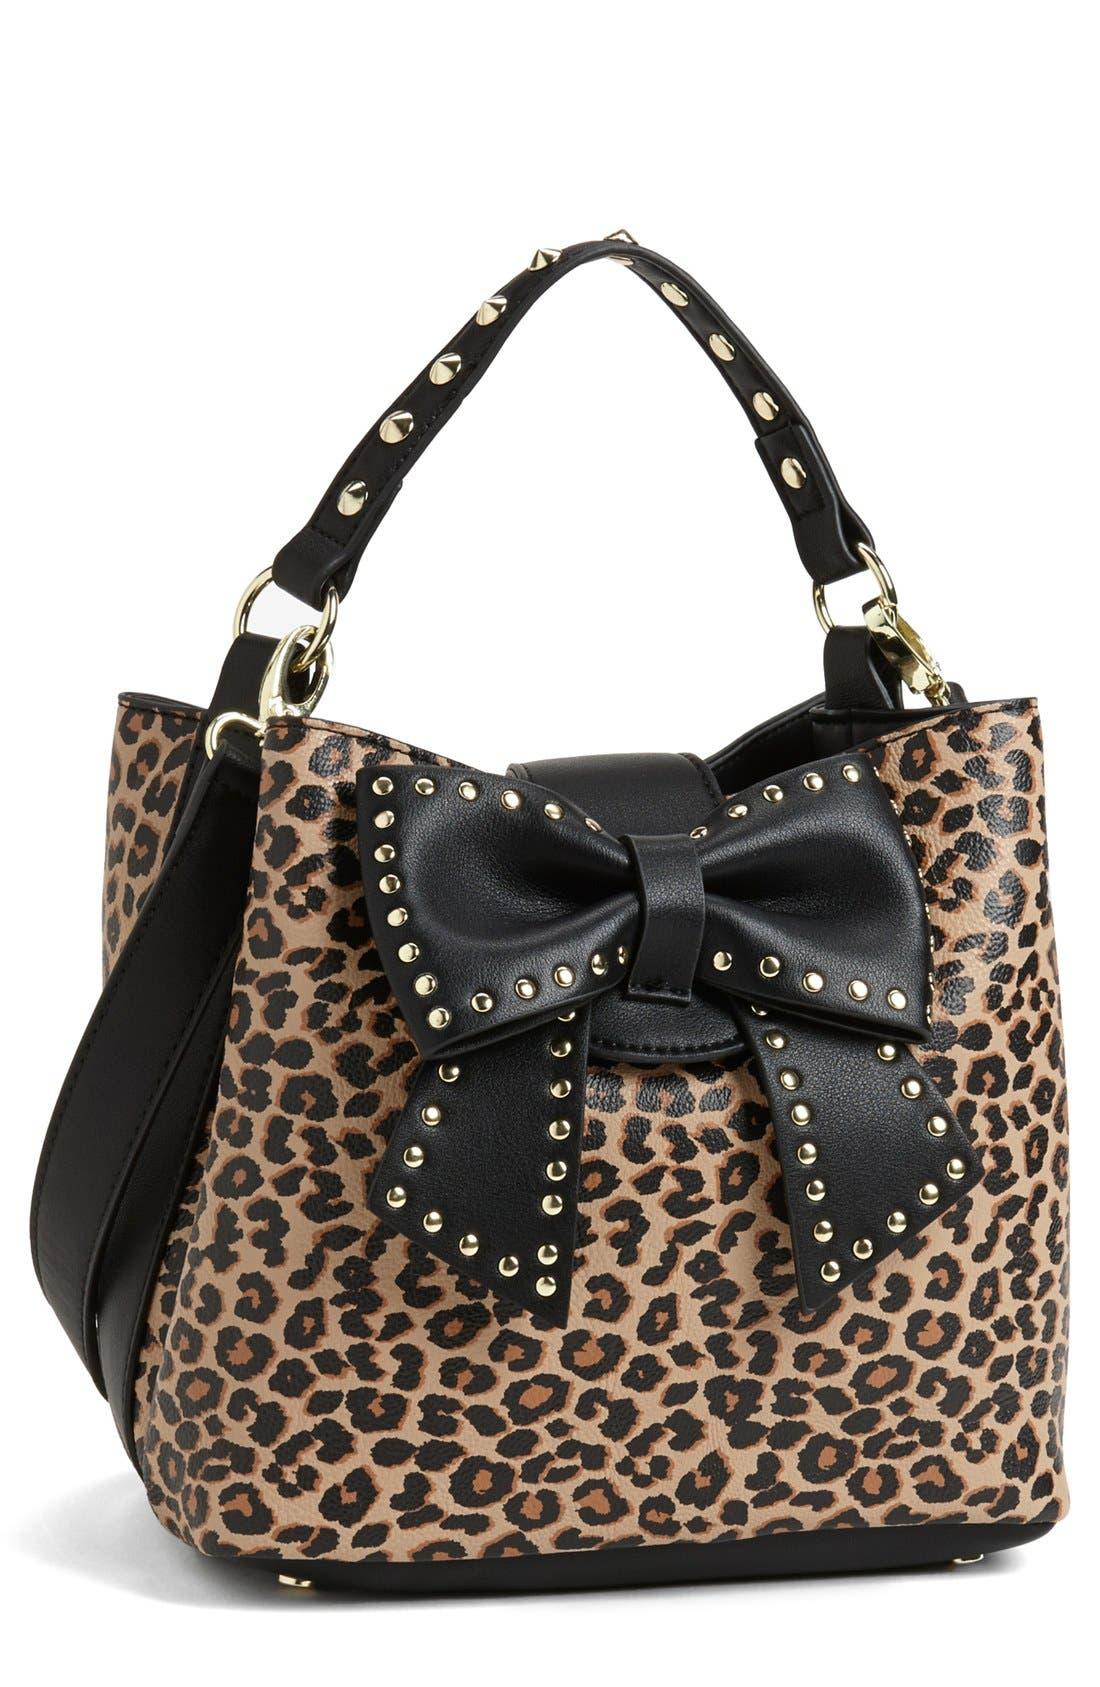 Alternate Image 1 Selected - Betsey Johnson 'Hopeless Romantic II' Faux Leather Bucket Bag